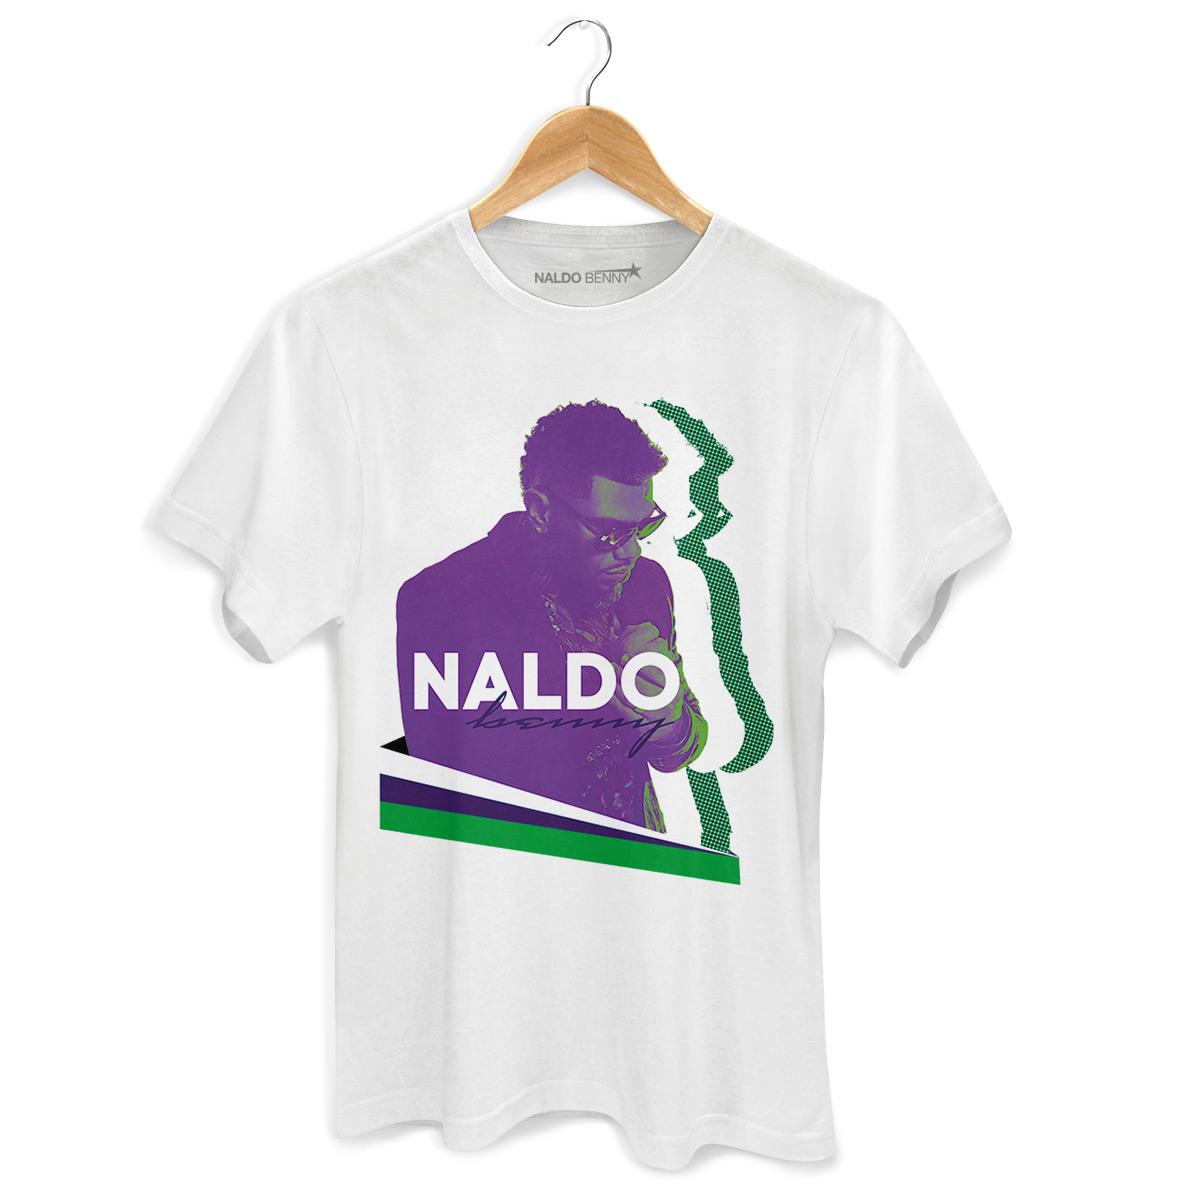 Camiseta Masculina Naldo Benny Colors